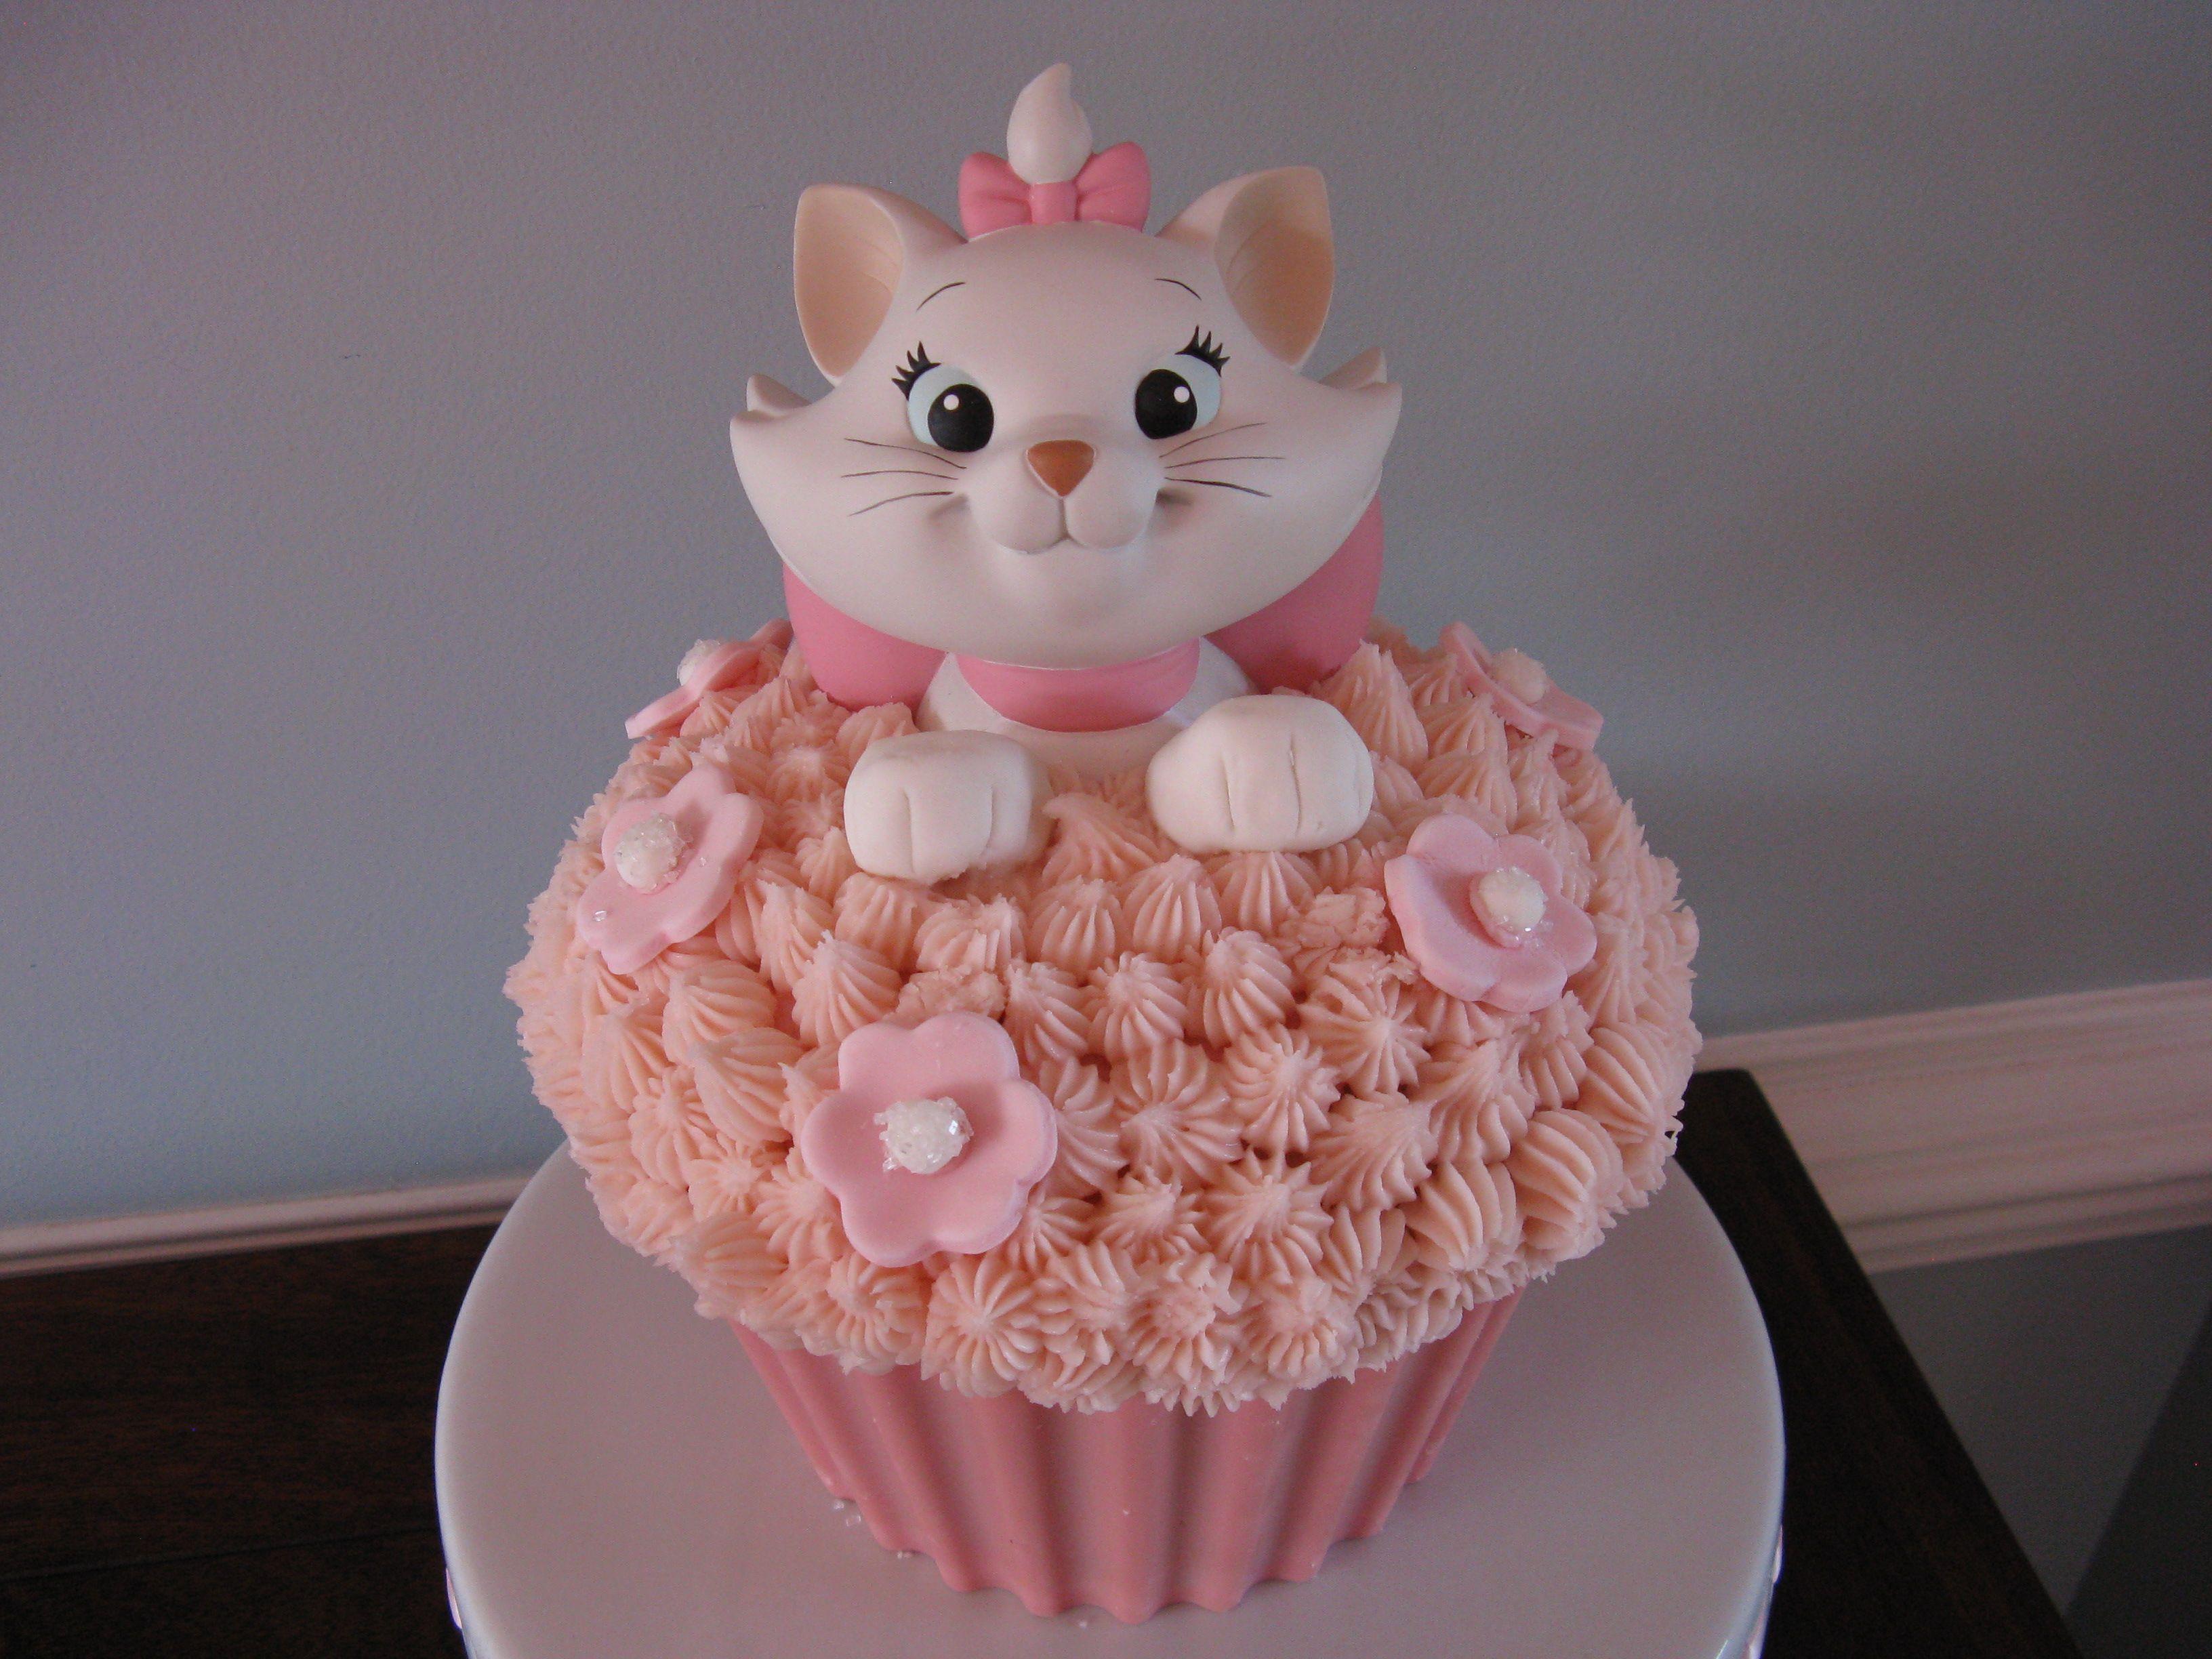 Marie cake Cute Cake and Cupcake Designs! Pinterest ...